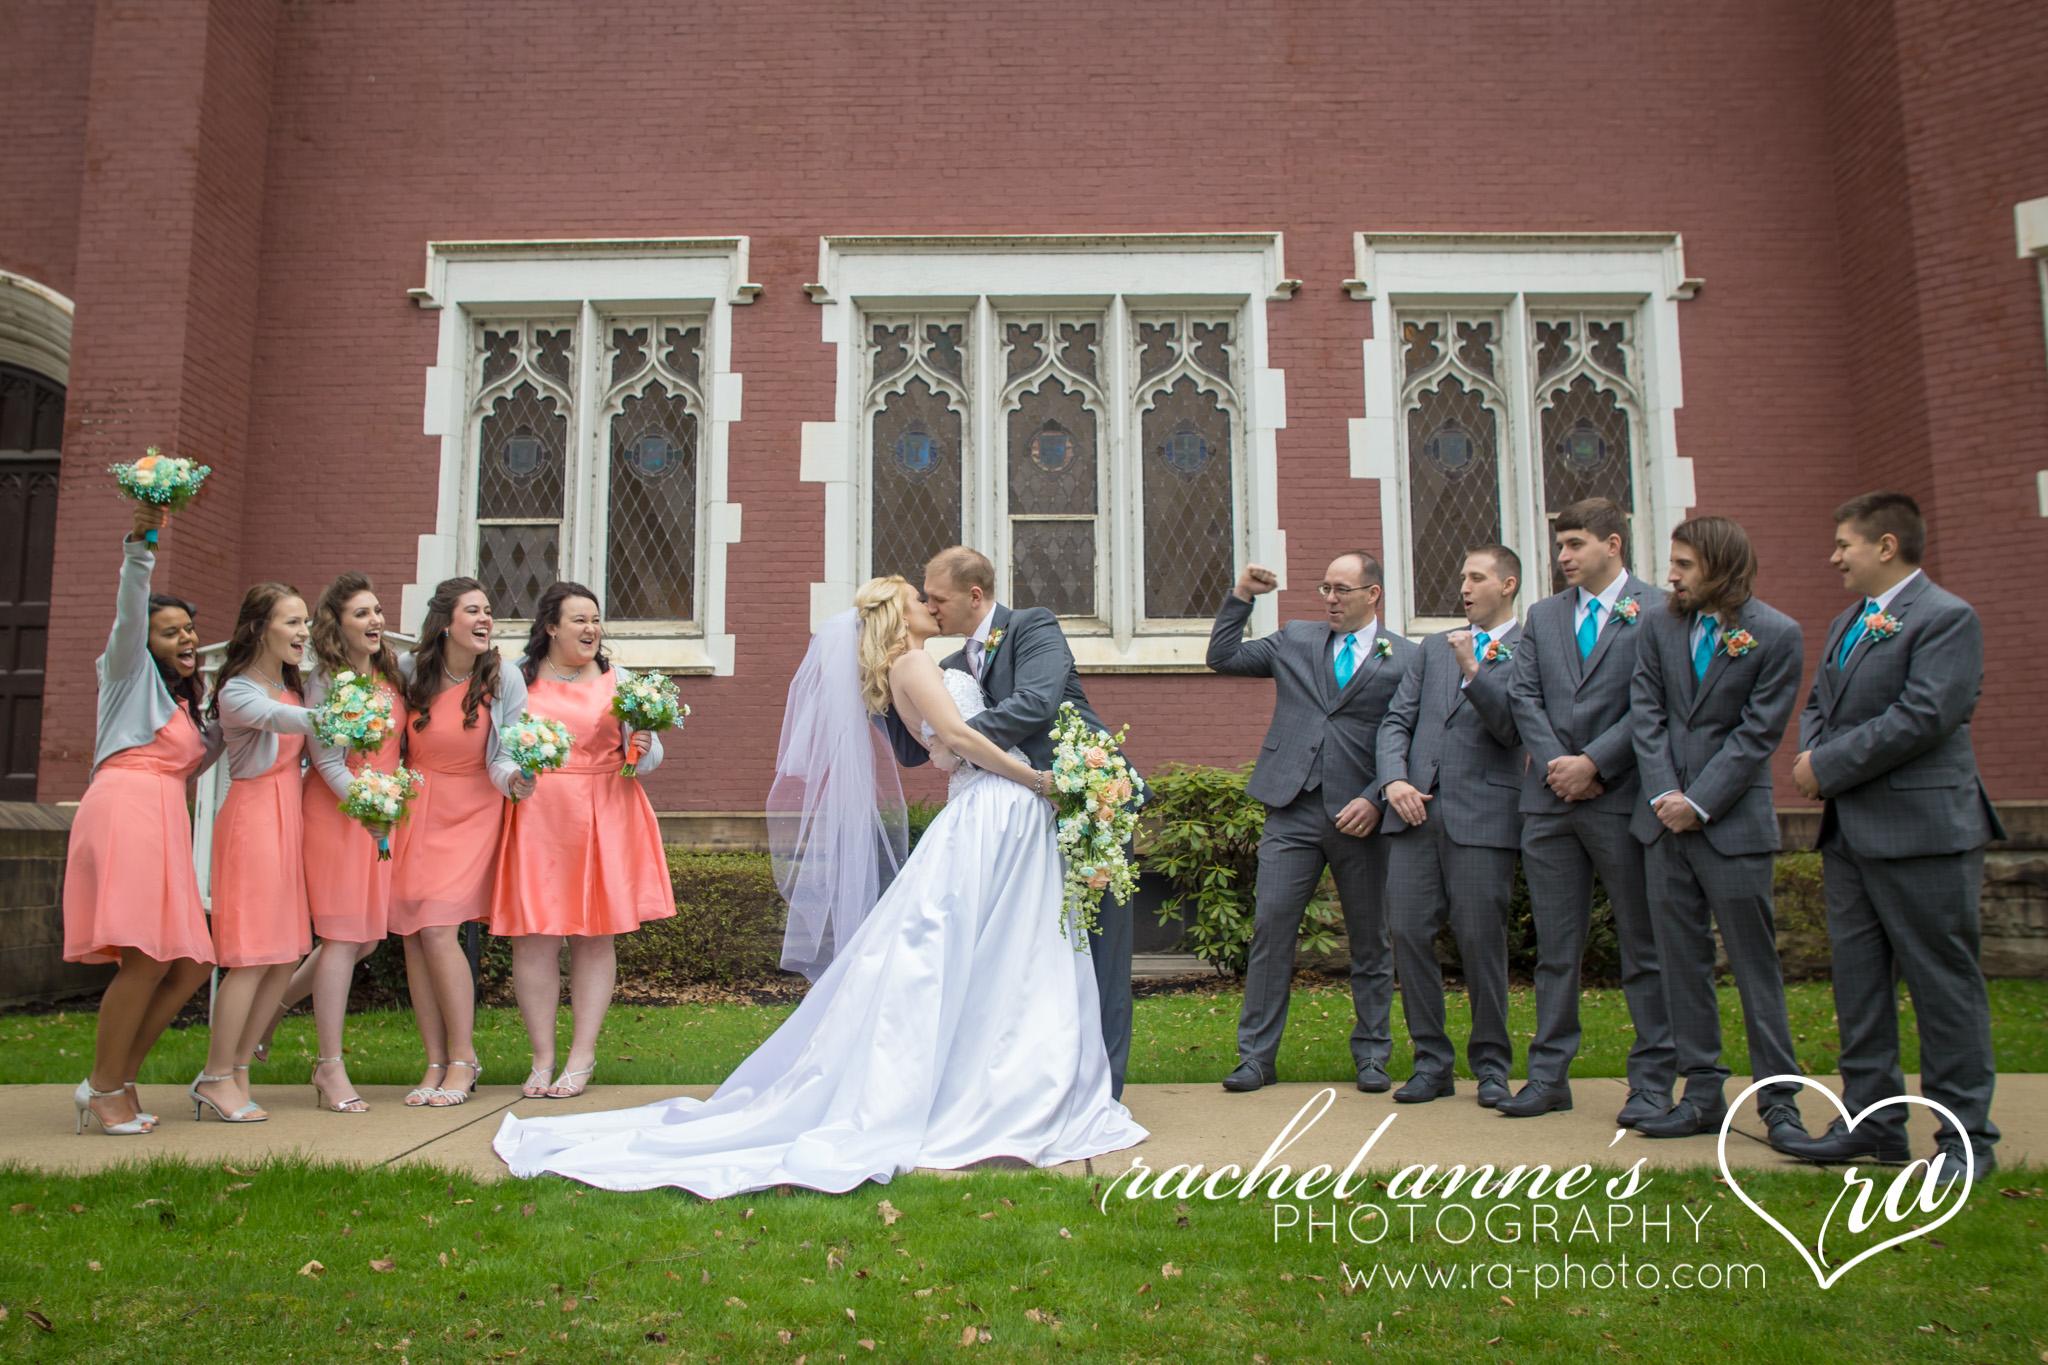 035-JKS-WEDDINGS-THE-FRANKLIN-PA.jpg